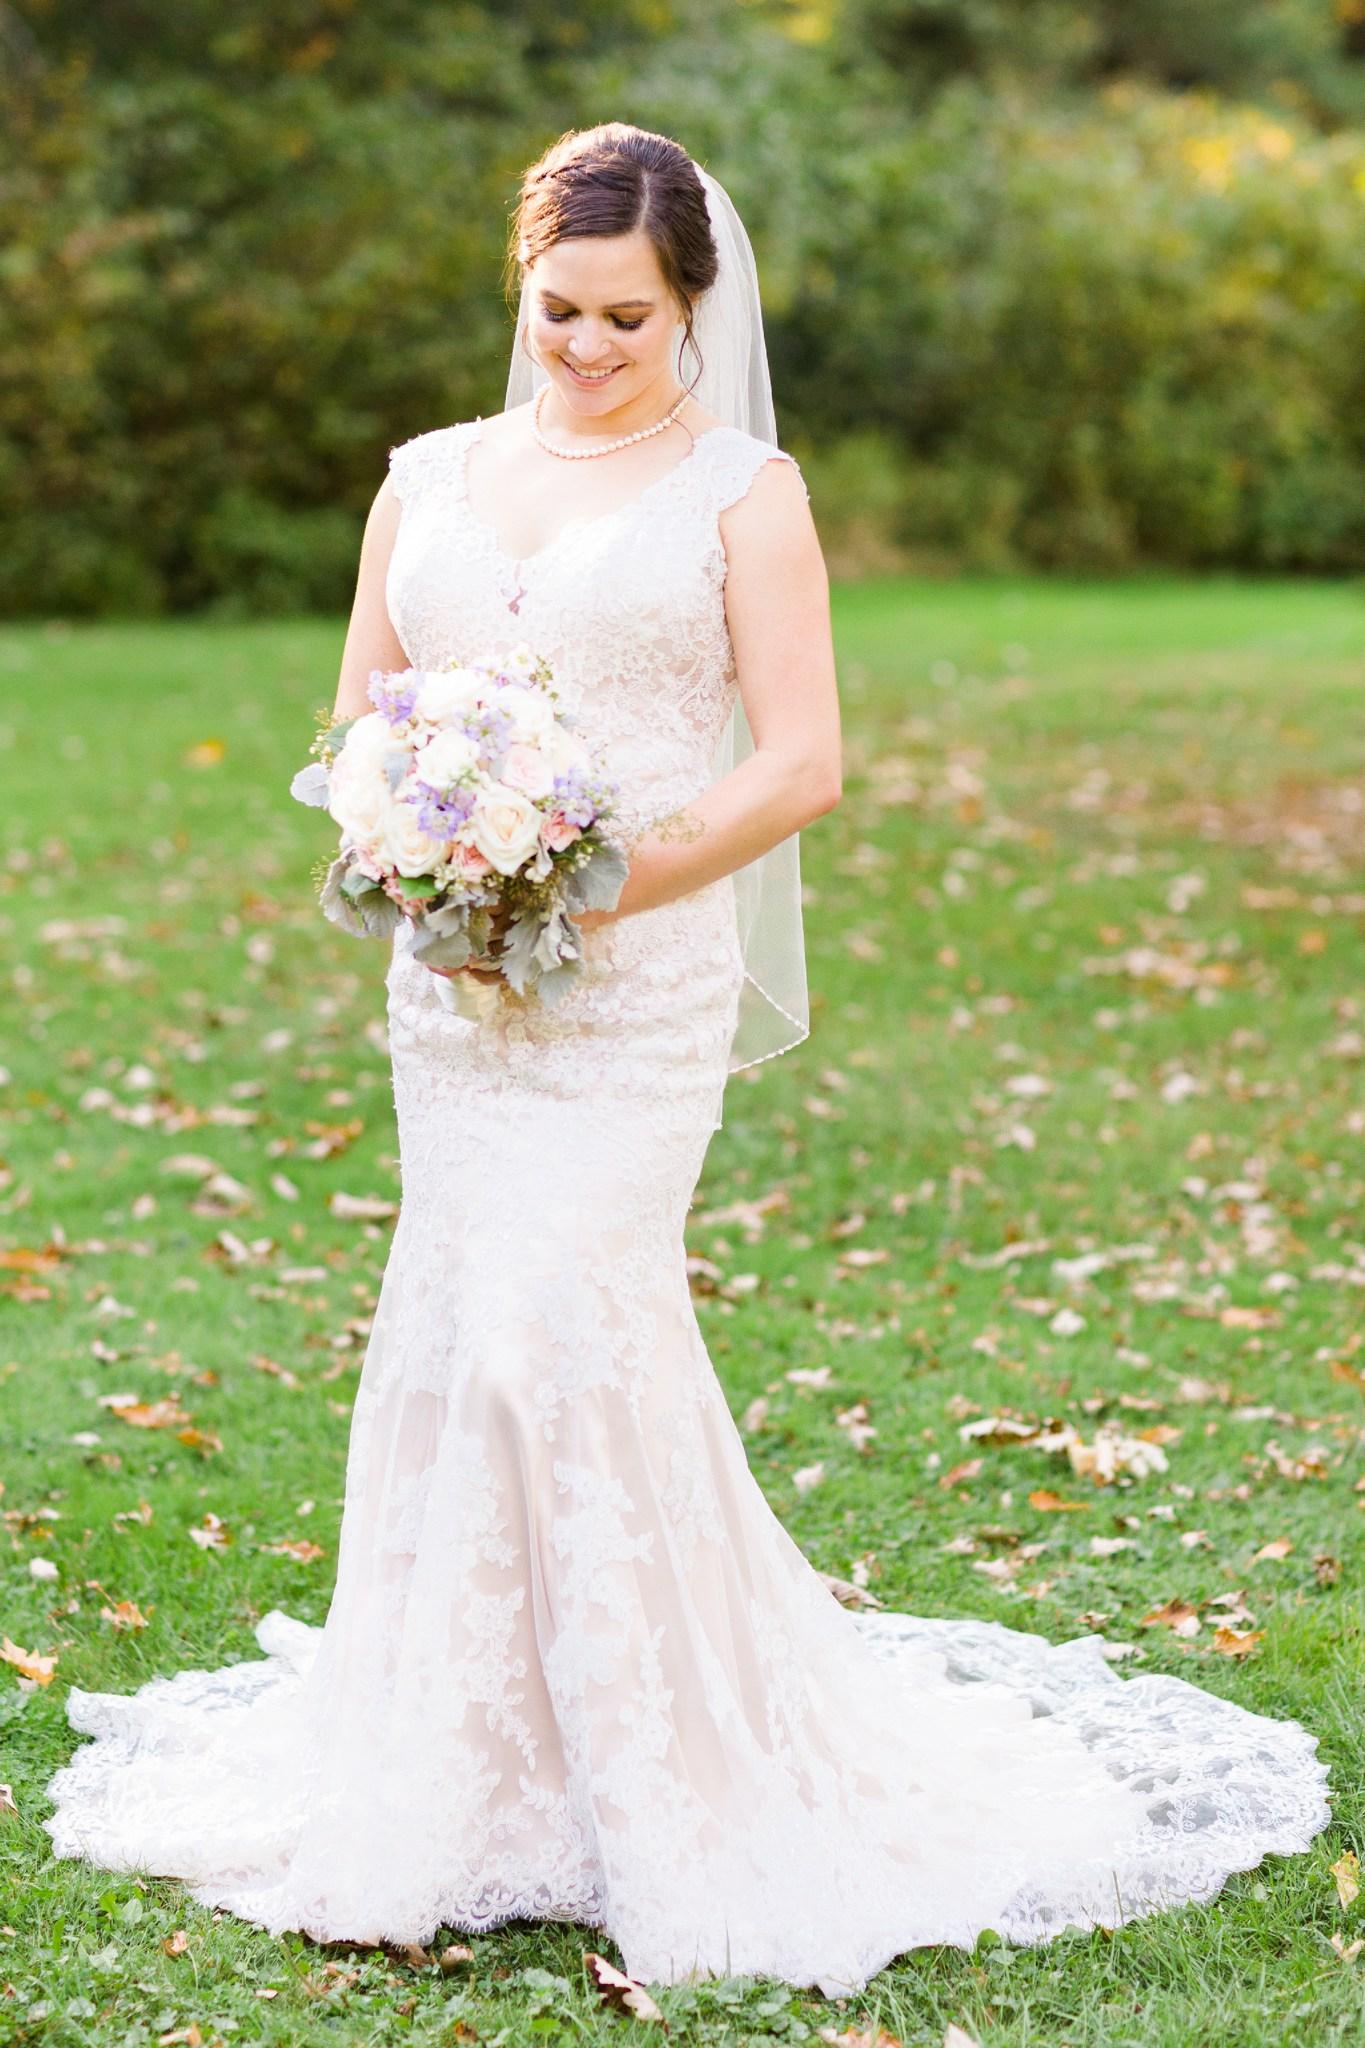 Fall_new_england_wedding_photos_00032.JPG